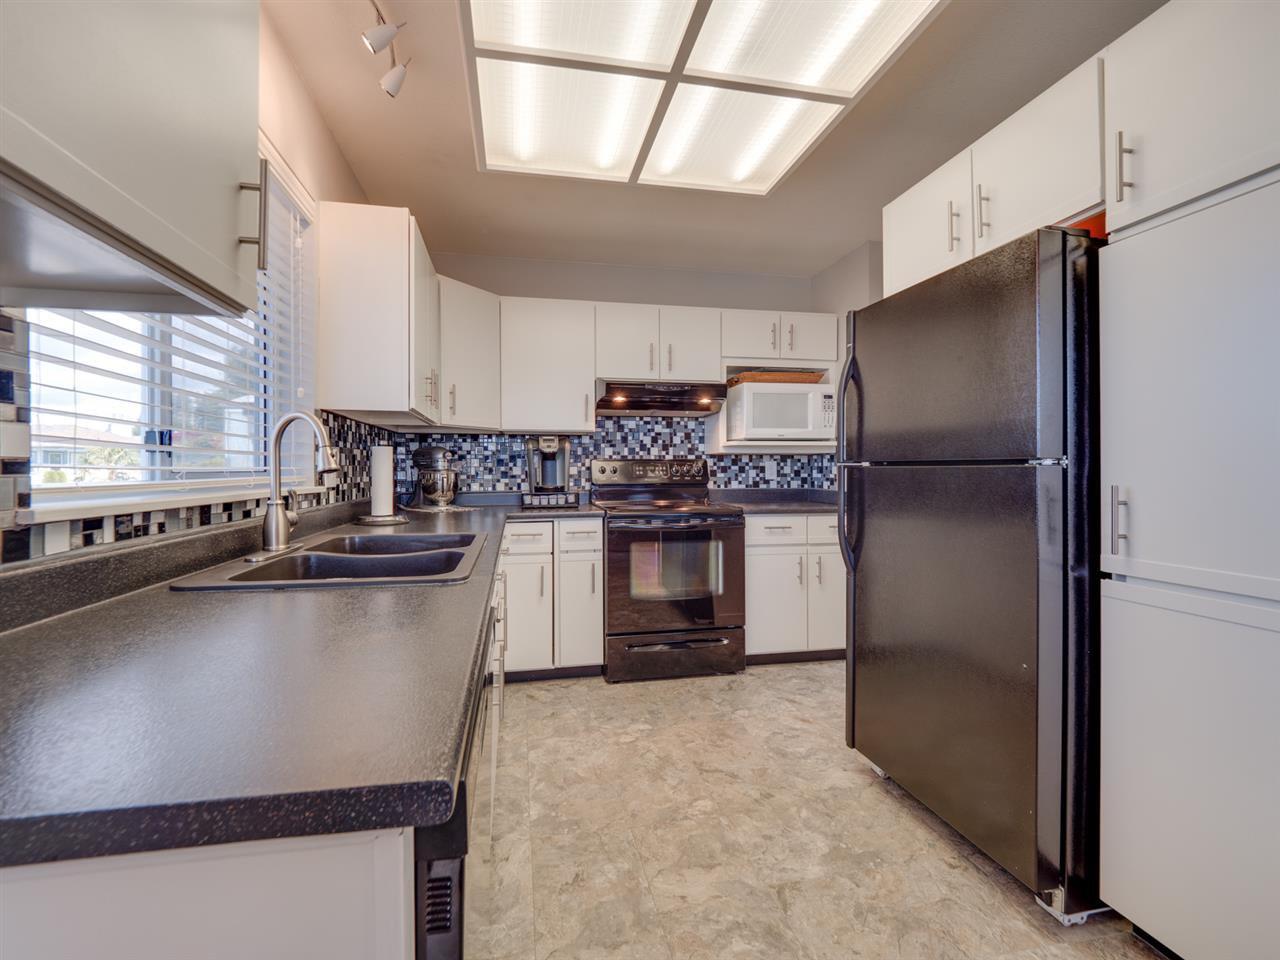 Photo 4: Photos: 4983 ARBUTUS Road in Sechelt: Sechelt District House for sale (Sunshine Coast)  : MLS®# R2427502